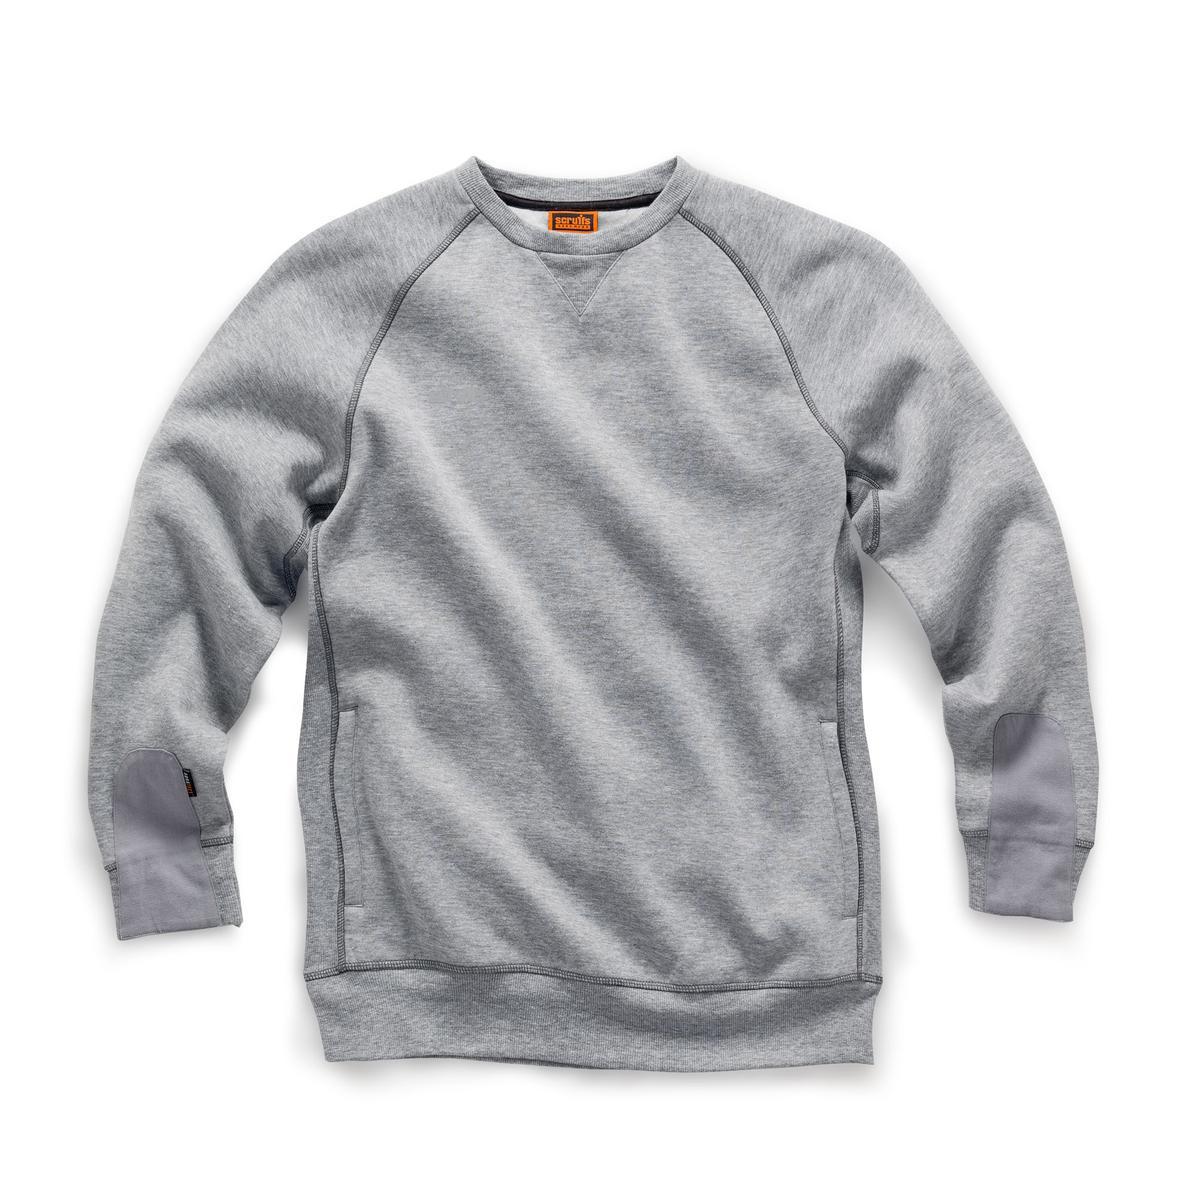 Scruffs Trade Sweatshirt Grey Marl SMALL